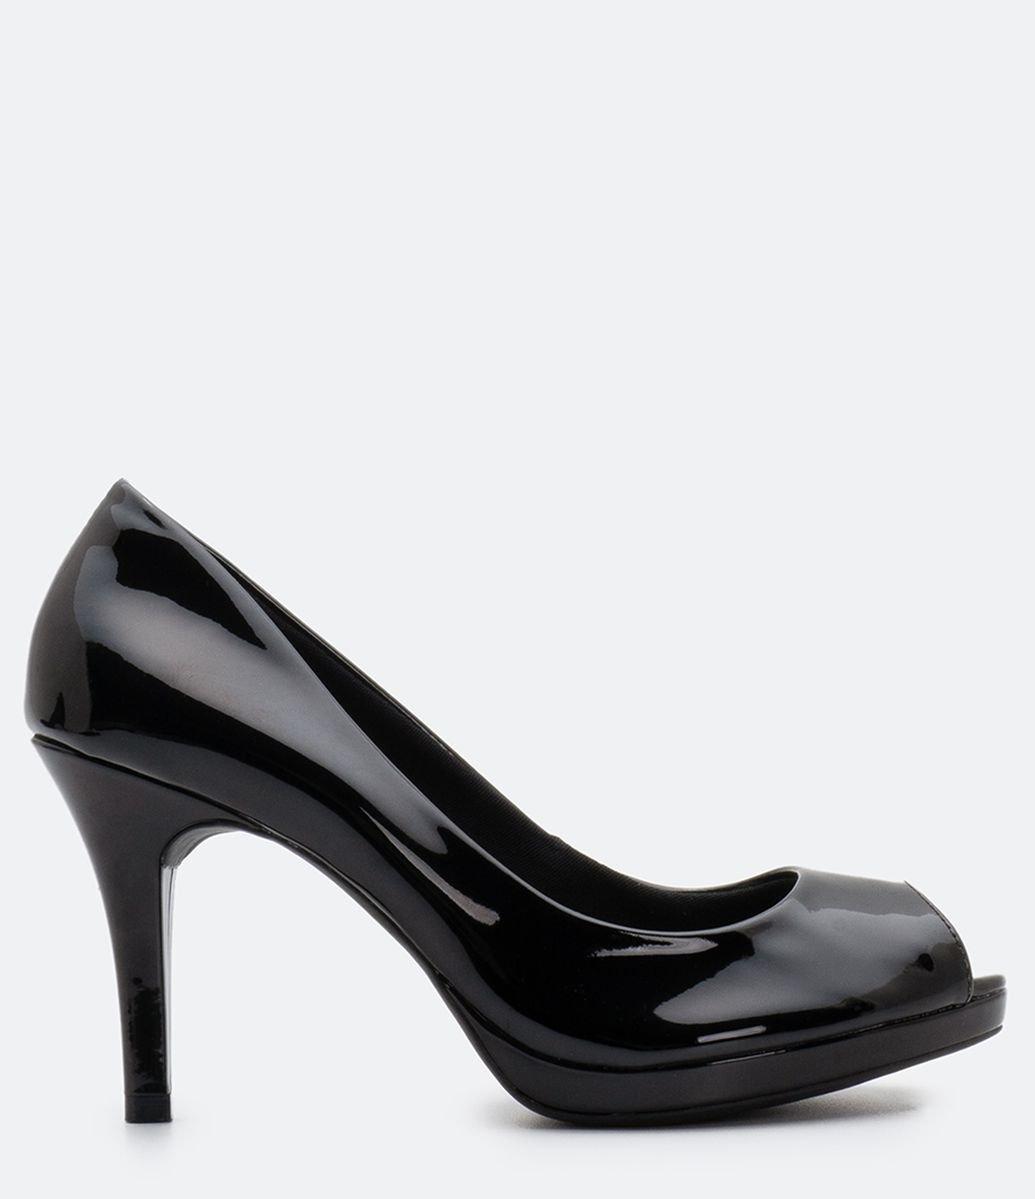 ba6d010db ... Sapato Feminino Peep Toe Via Marte. Brinde